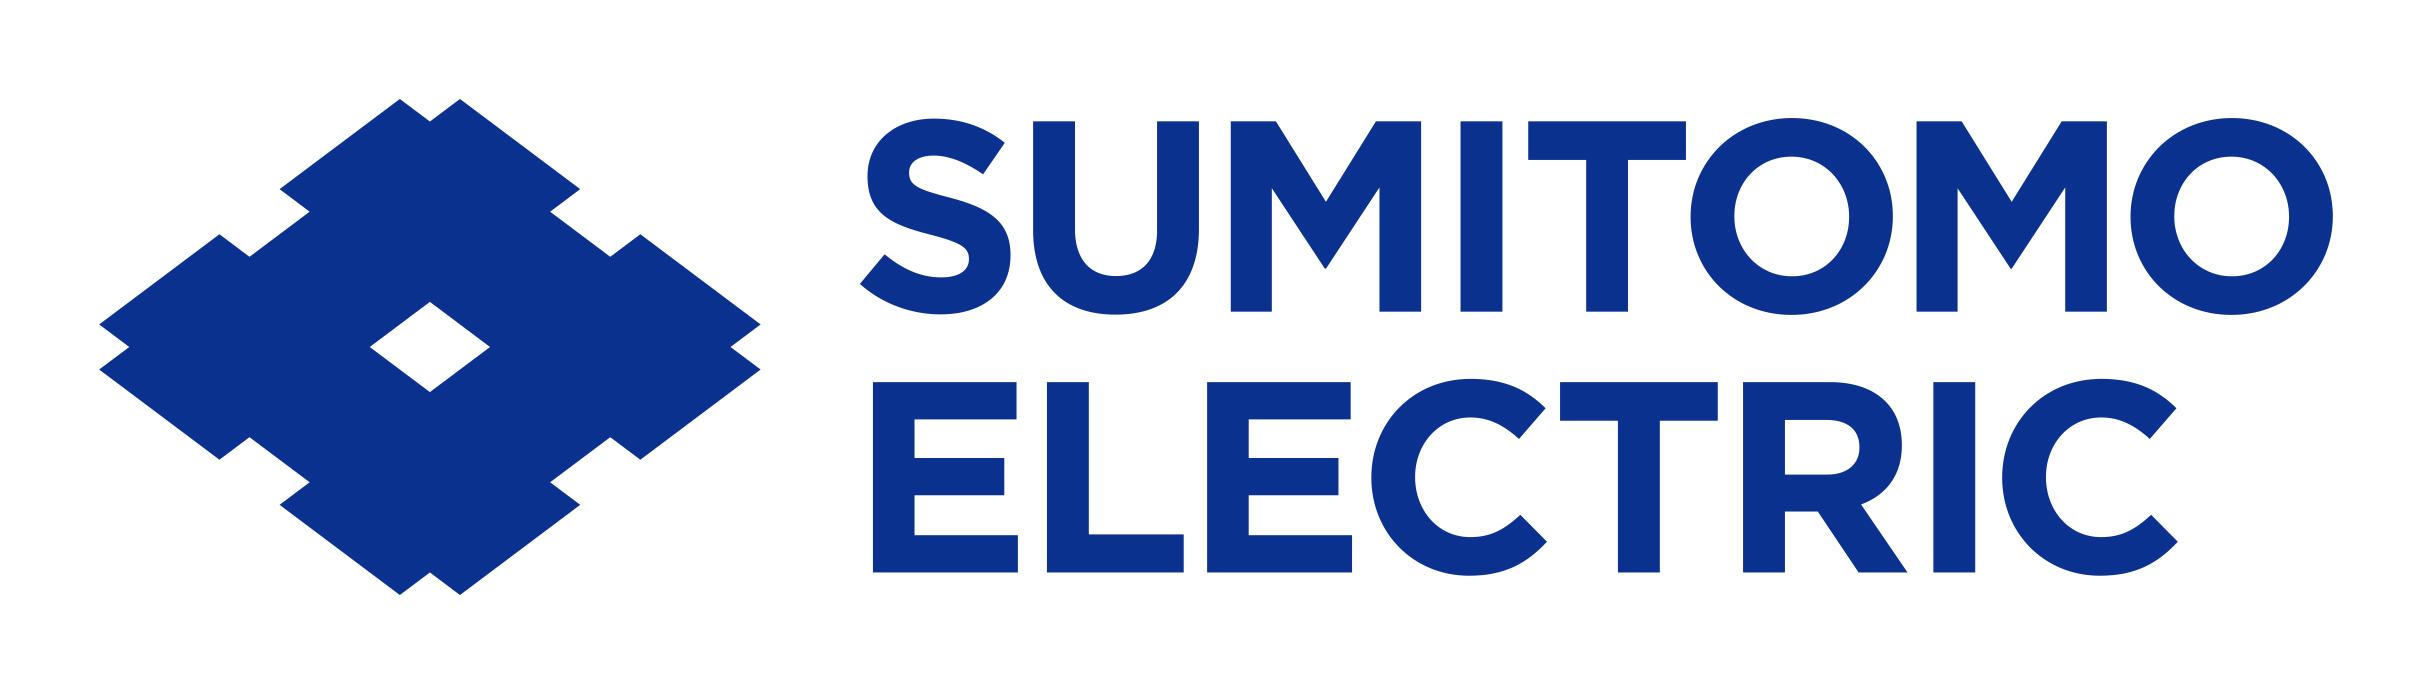 Sumitomo Electric logo